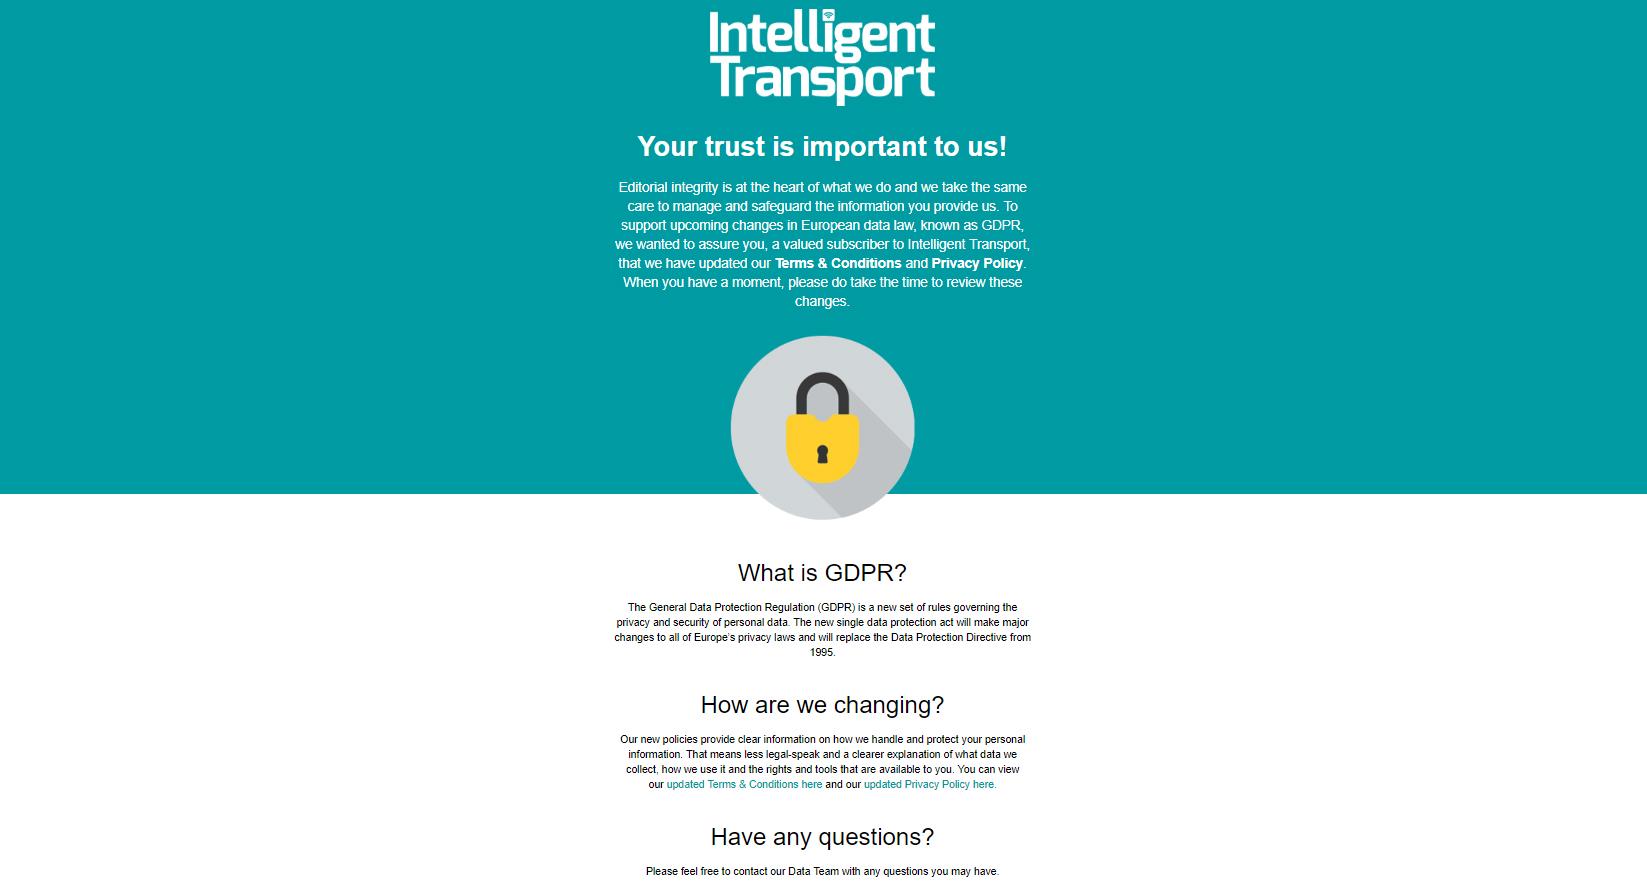 Intelligent Transport GDPR email